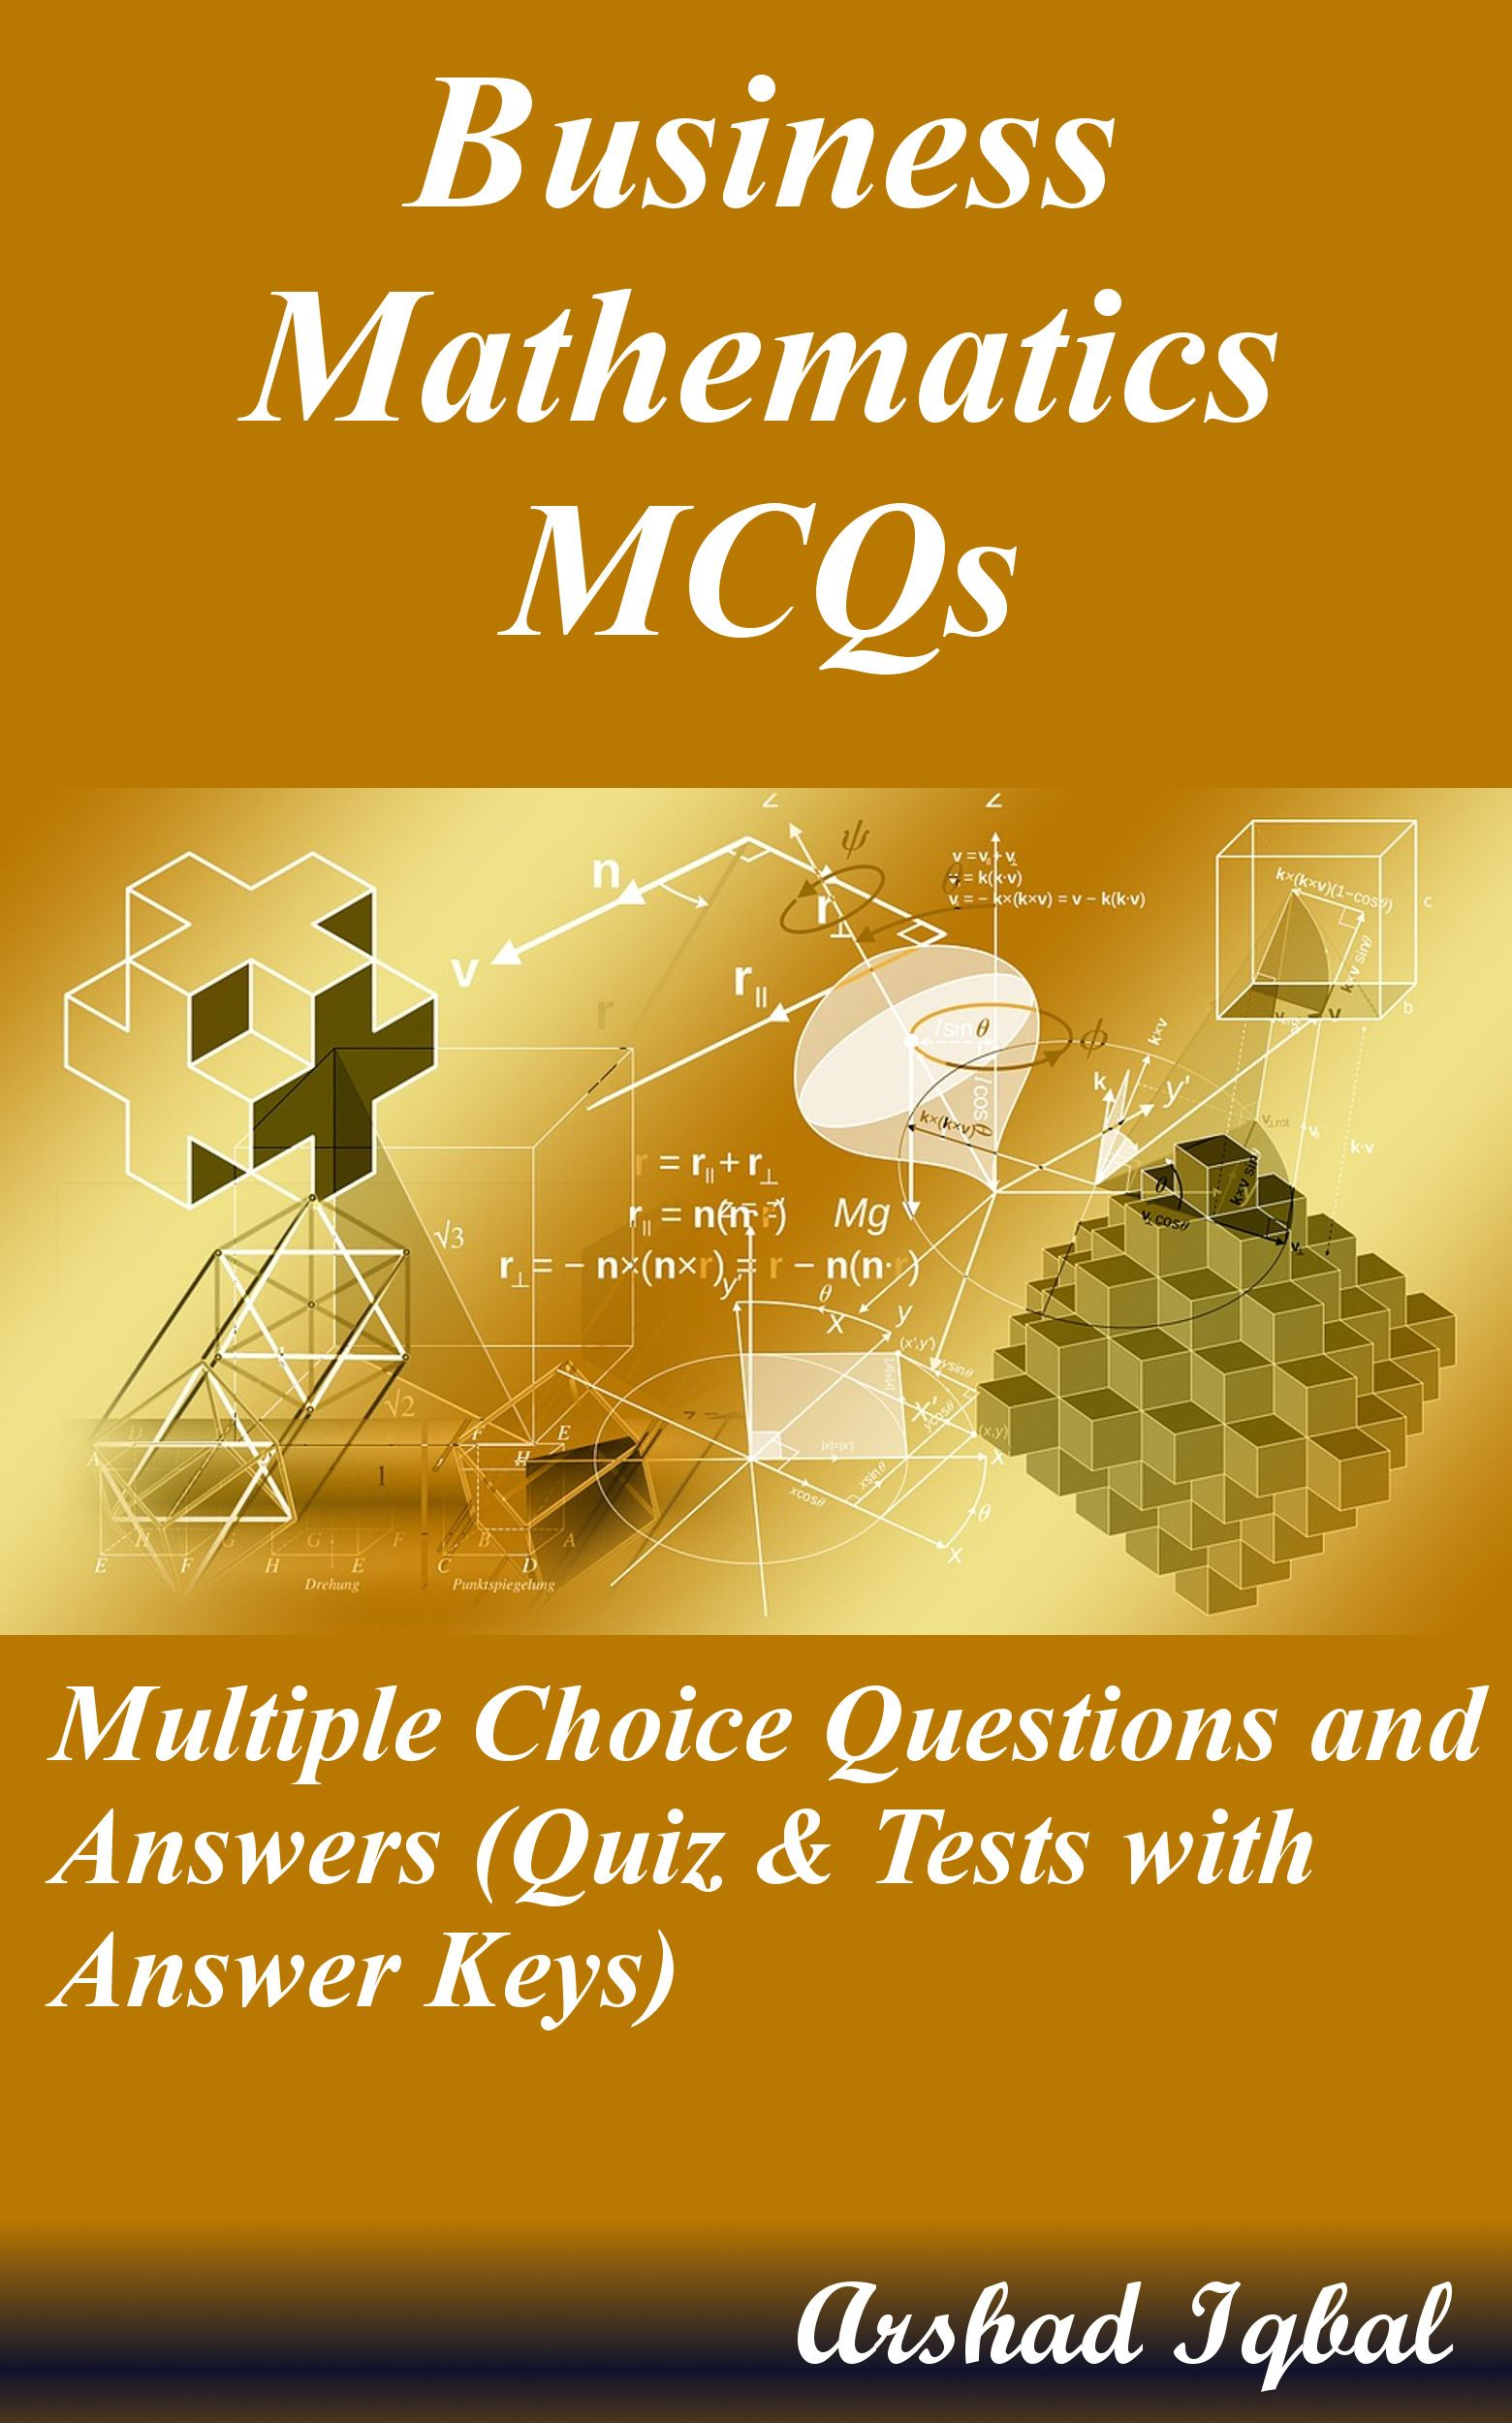 Business mathematics MCQs has 607 multiple choice questions ...